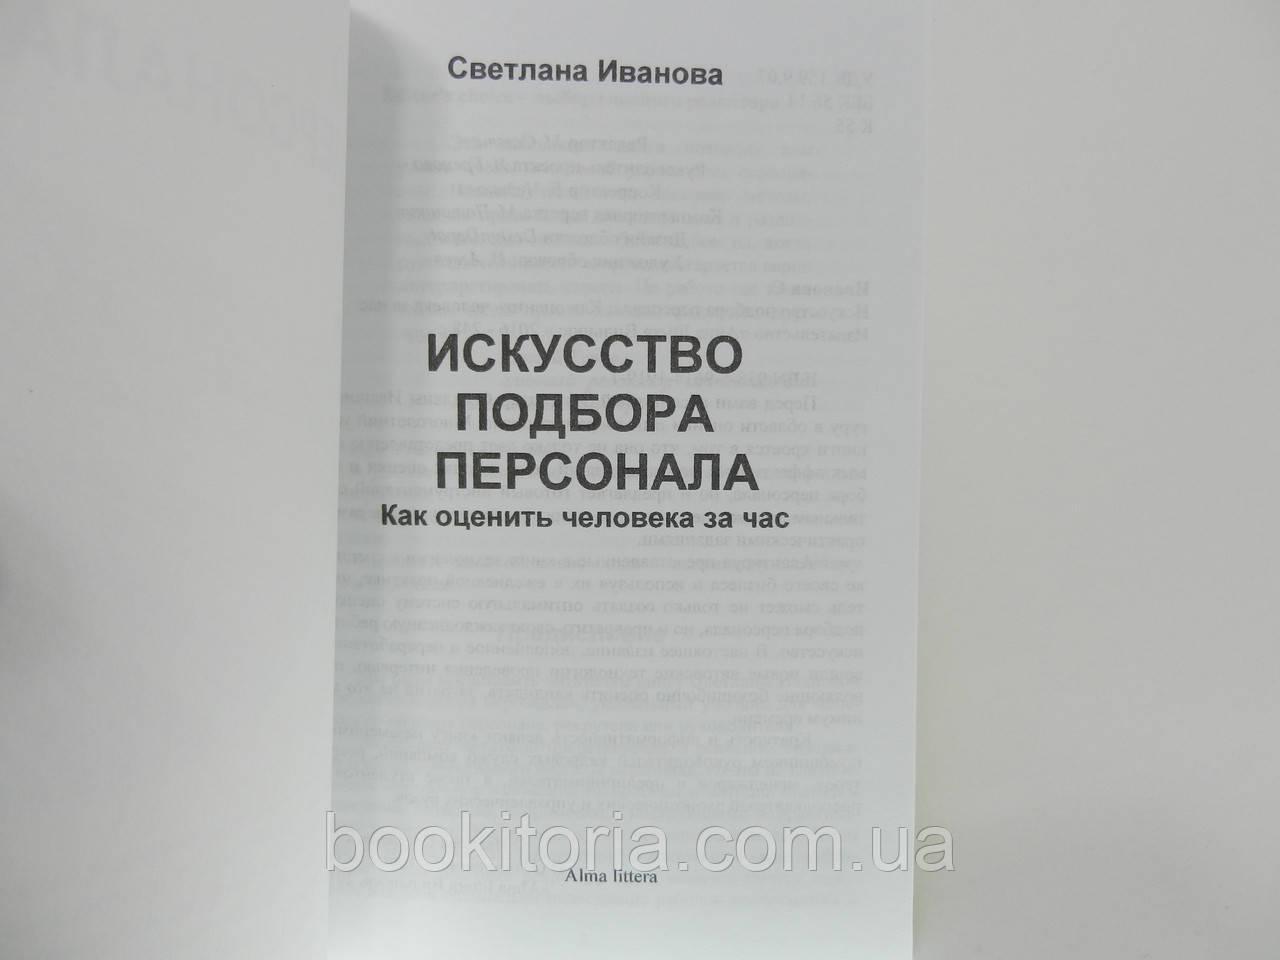 Иванова С. Искусство подбора персонала. - фото 5